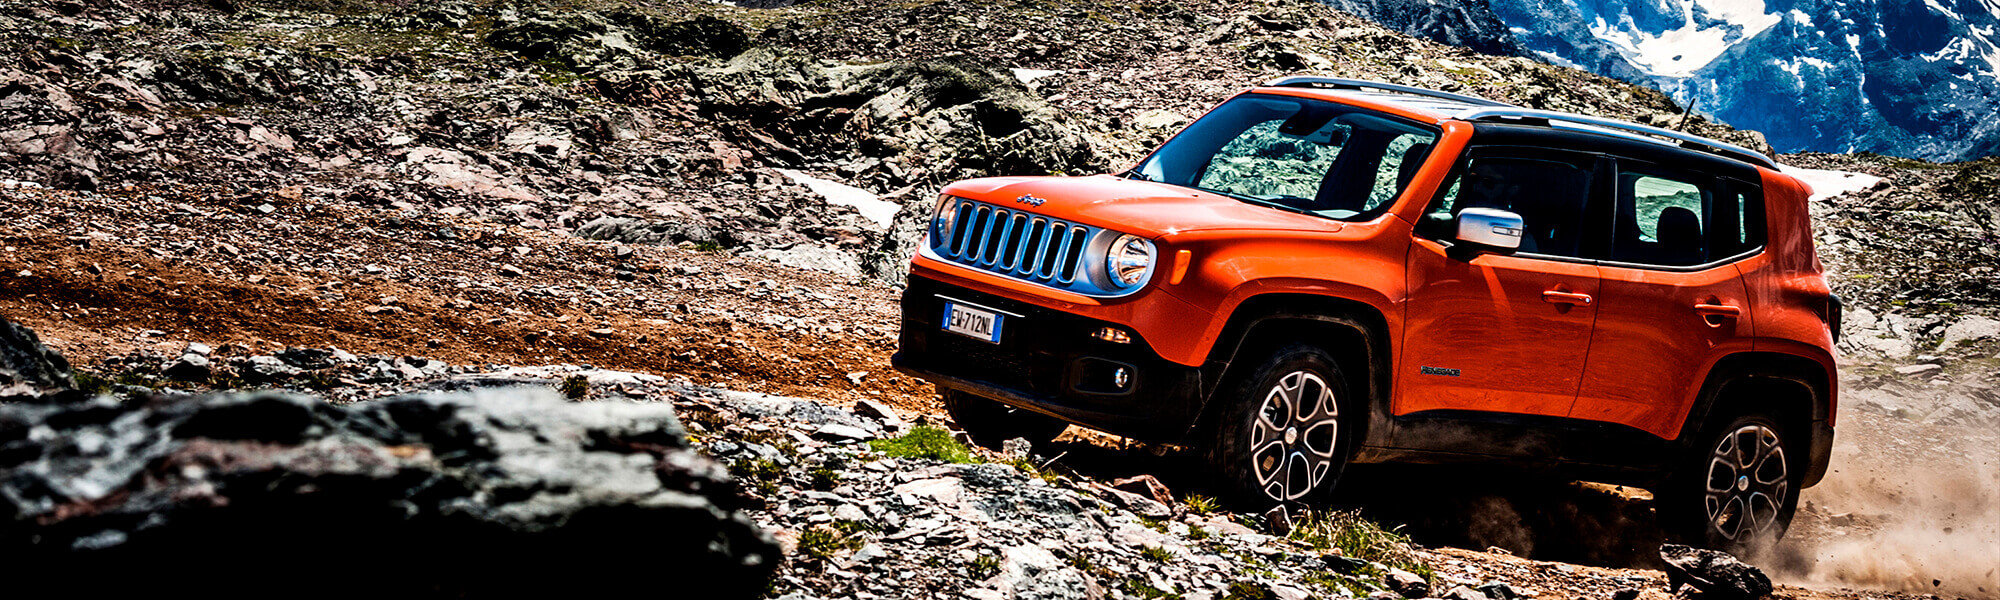 ulmen-jeep-renegade-slider-2